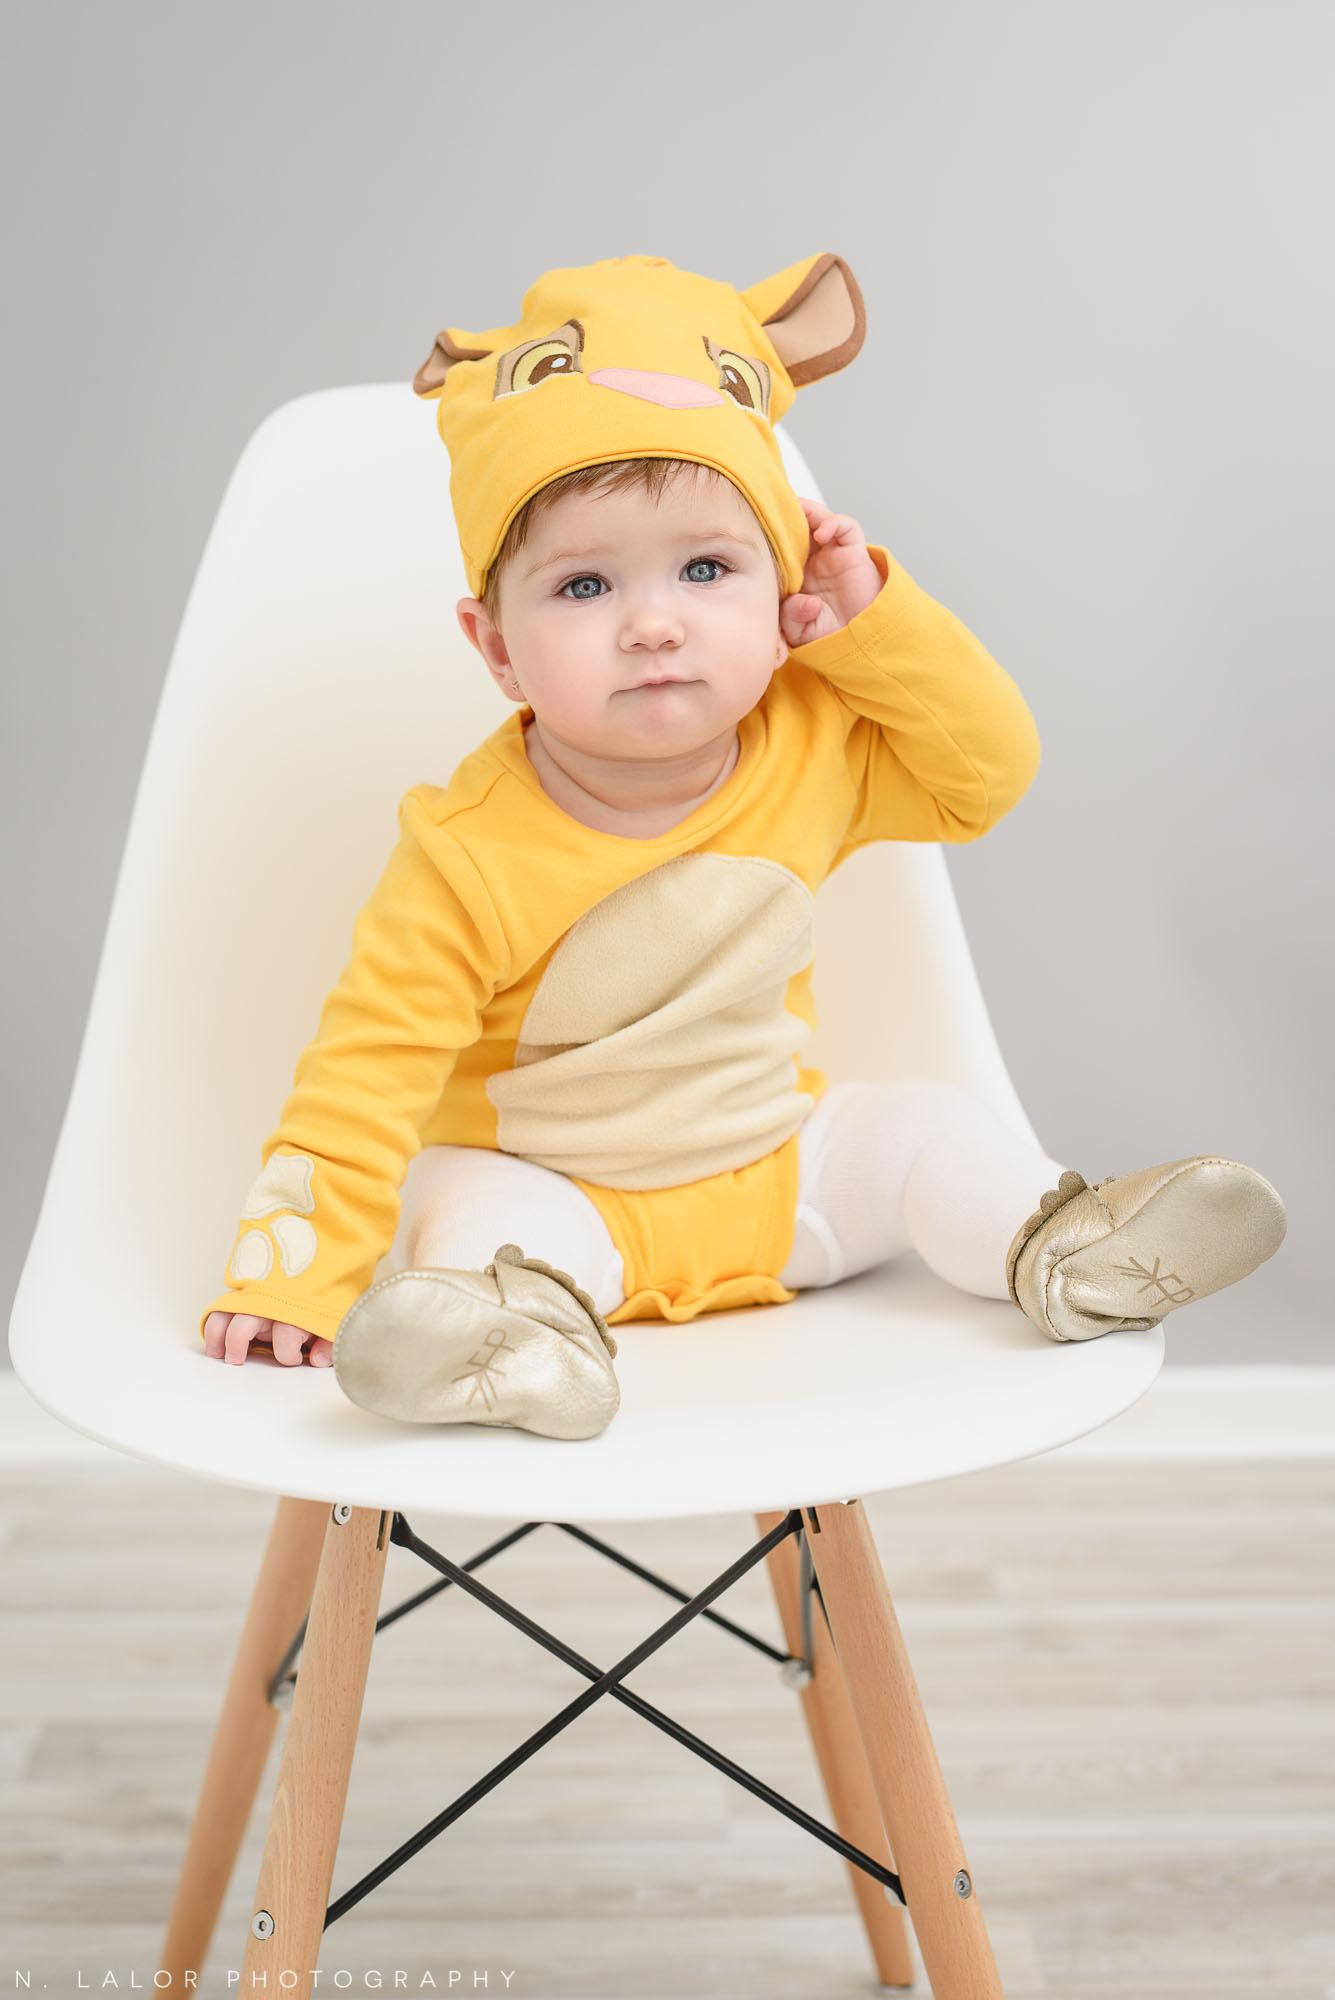 Little lion. Halloween Kids Portrait by N. Lalor Photography. Greenwich, Connecticut.